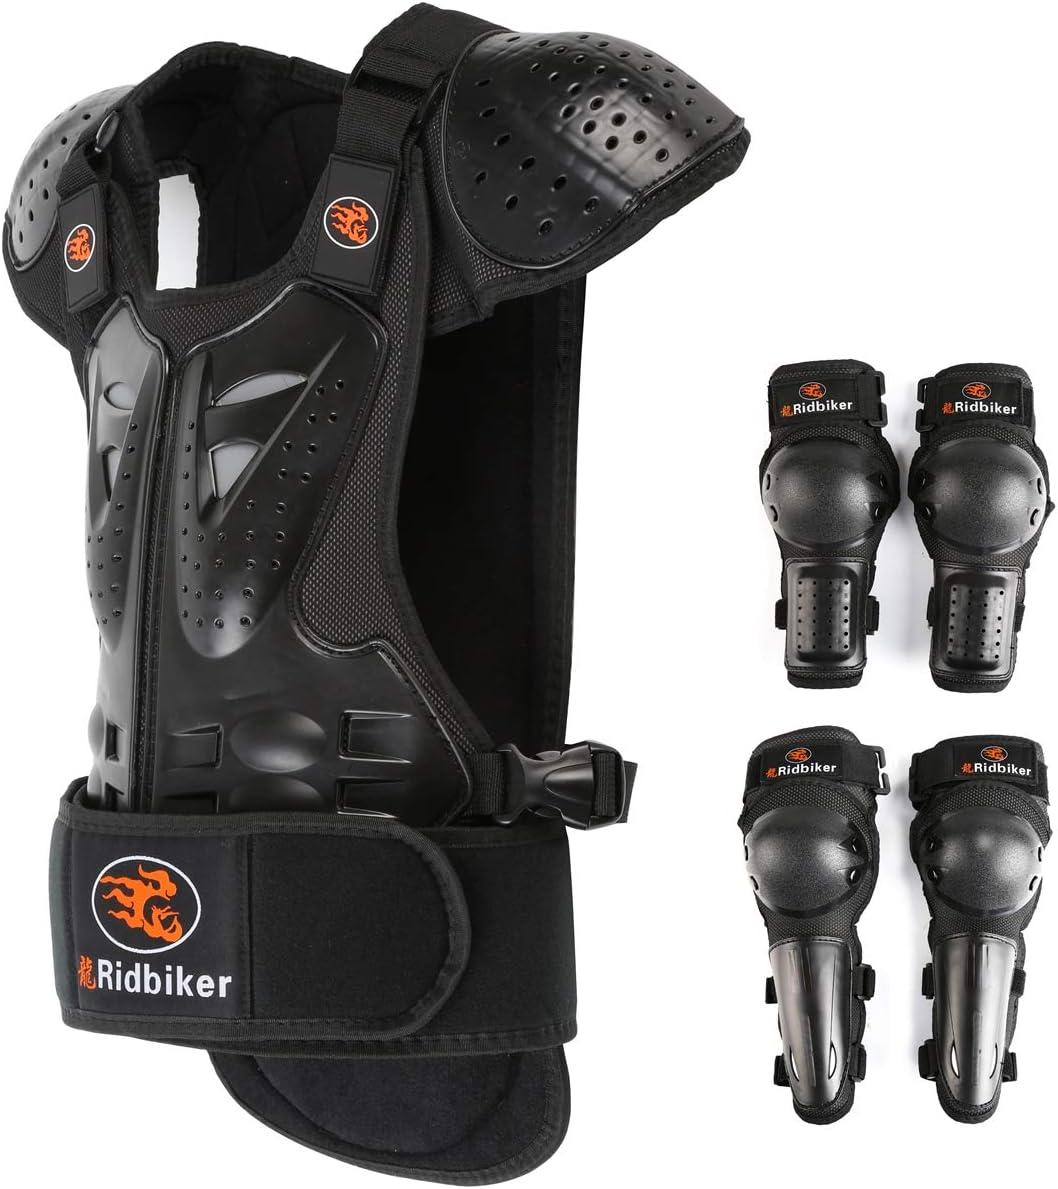 RIDBIKER Kids Motorcycle Armor Suit Dirt Bike Chest Spine Protector Back Shoulder Arm Elbow Knee Protector Body Armor Vest